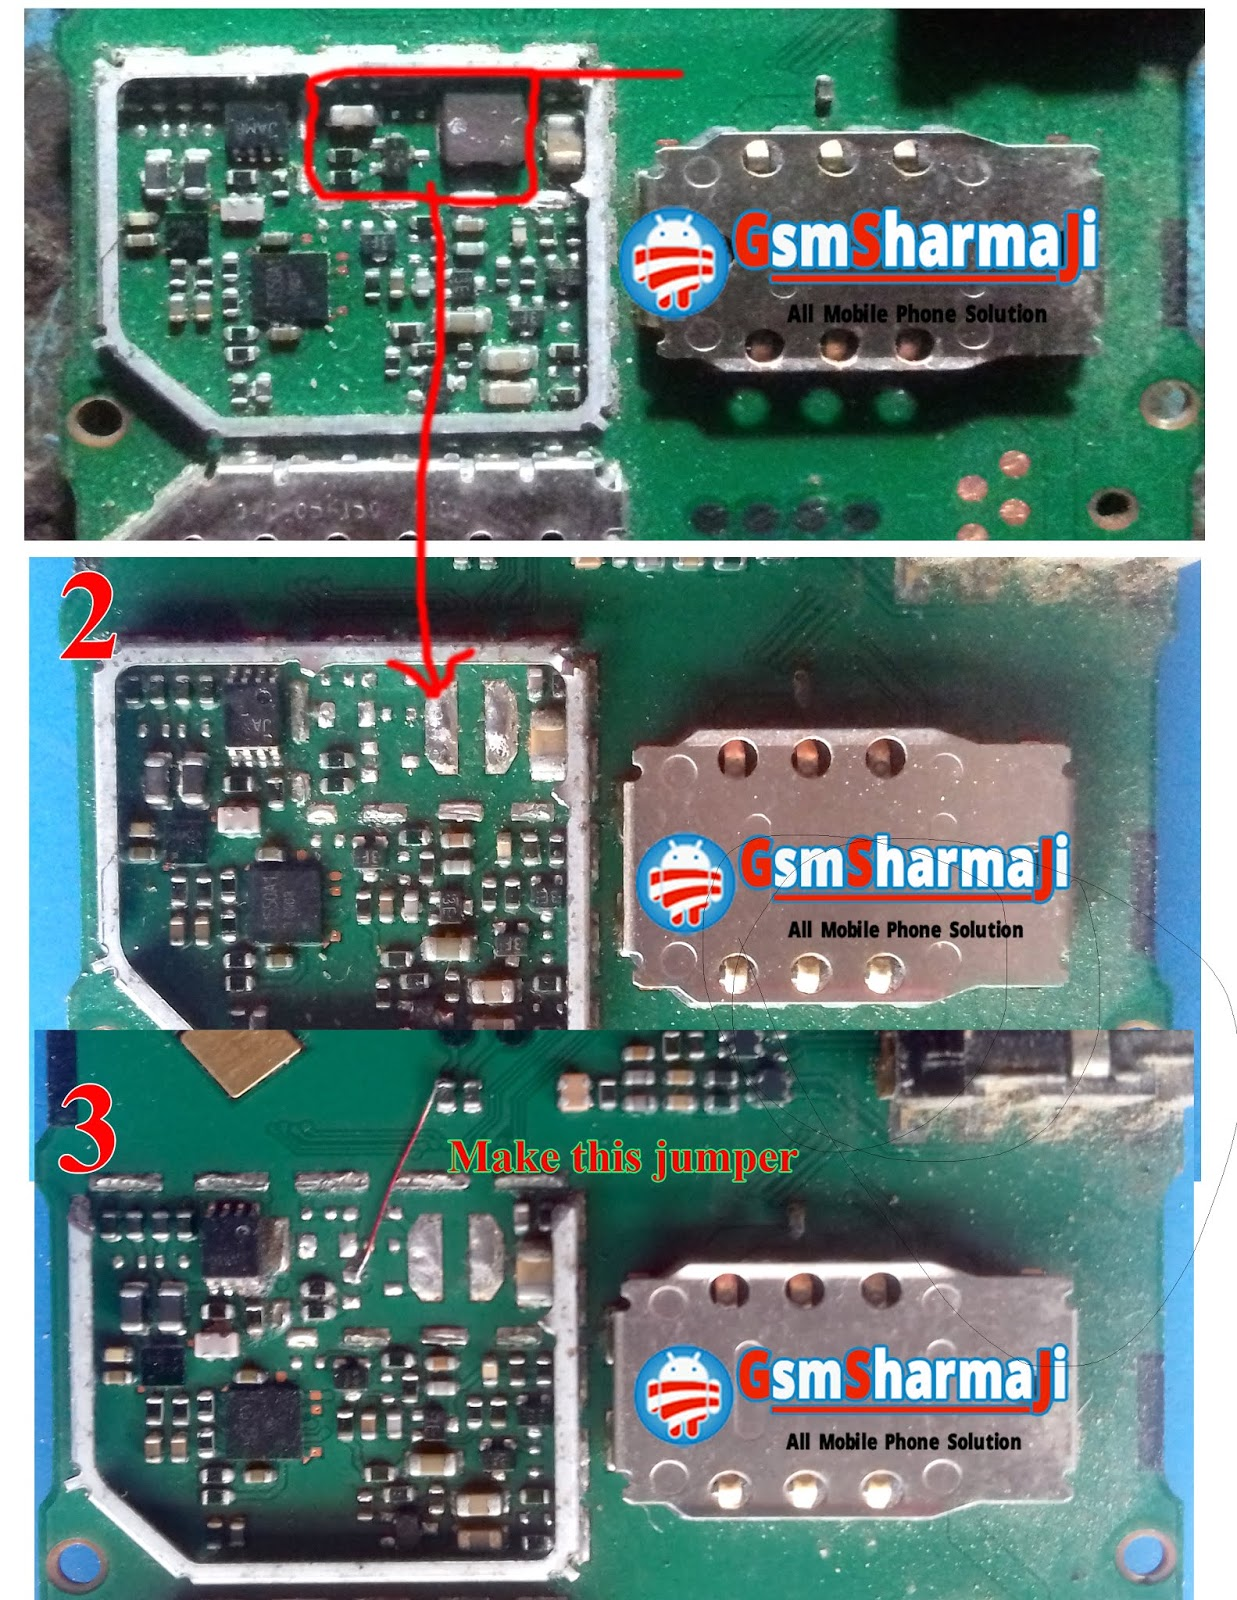 Nokia 1202 Display Light Repair Light Problem Solution Jumper Ways,nokia 1202 display light jumper